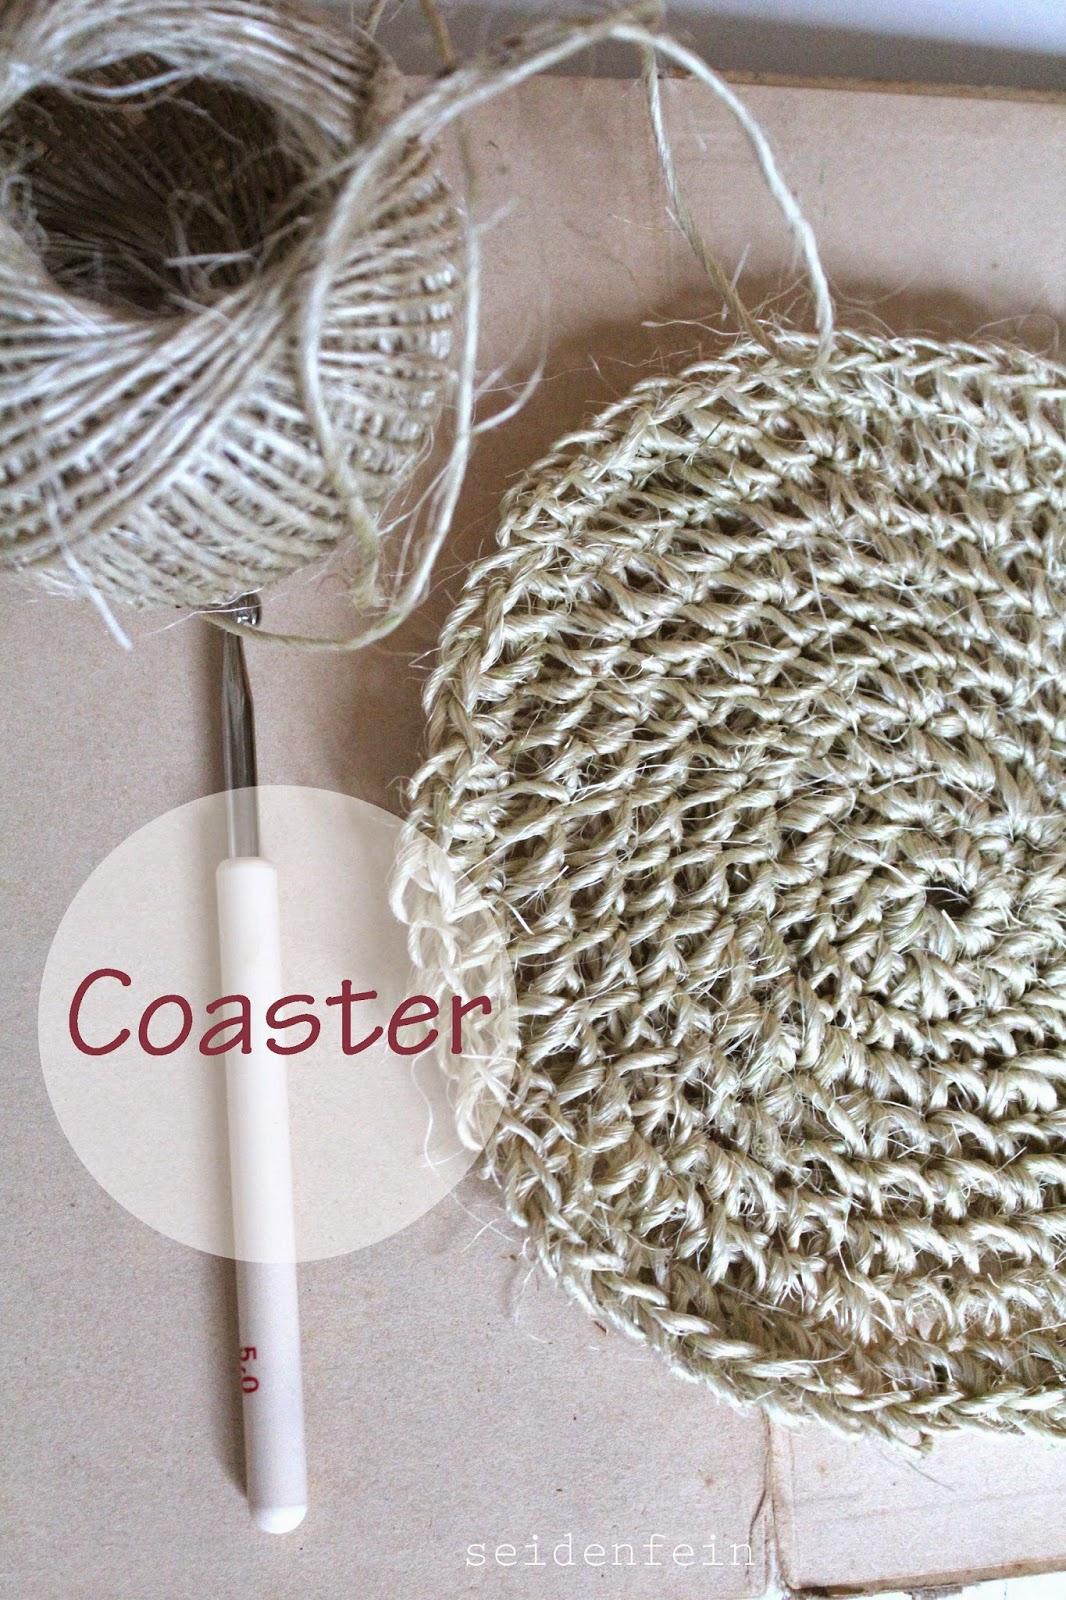 seidenfeins blog vom sch nen landleben hitzefest geh kelt diy crochet heat firm coaster. Black Bedroom Furniture Sets. Home Design Ideas